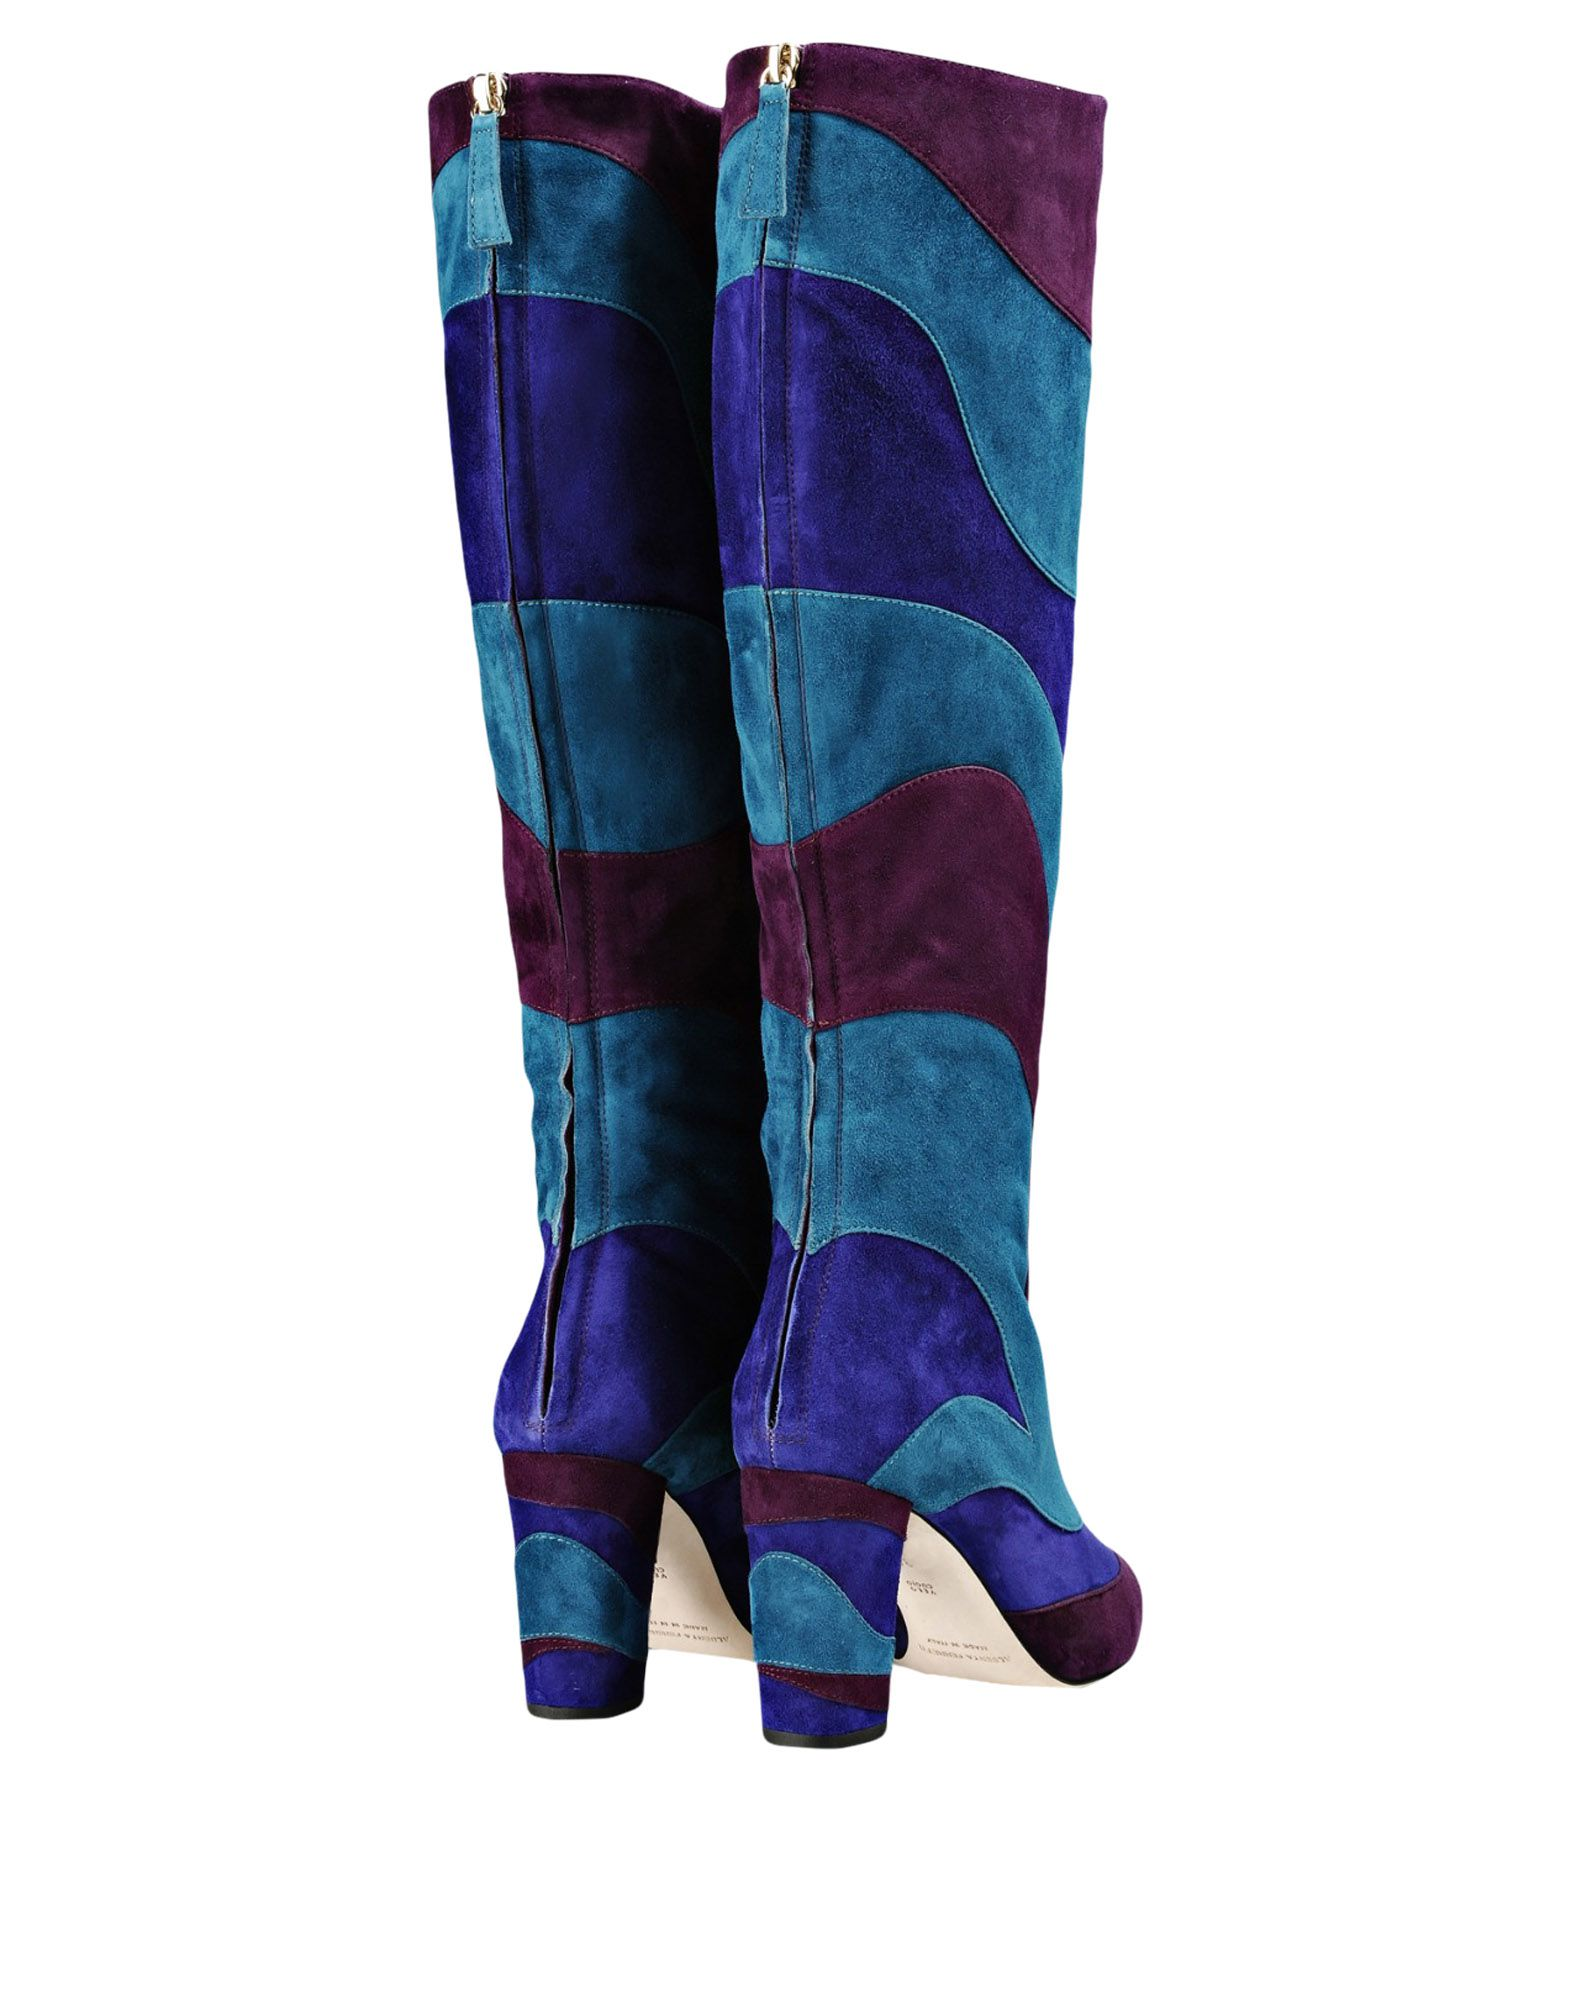 Alberta Ferretti Stiefel 11305718RJ Damen  11305718RJ Stiefel Neue Schuhe 142e2d